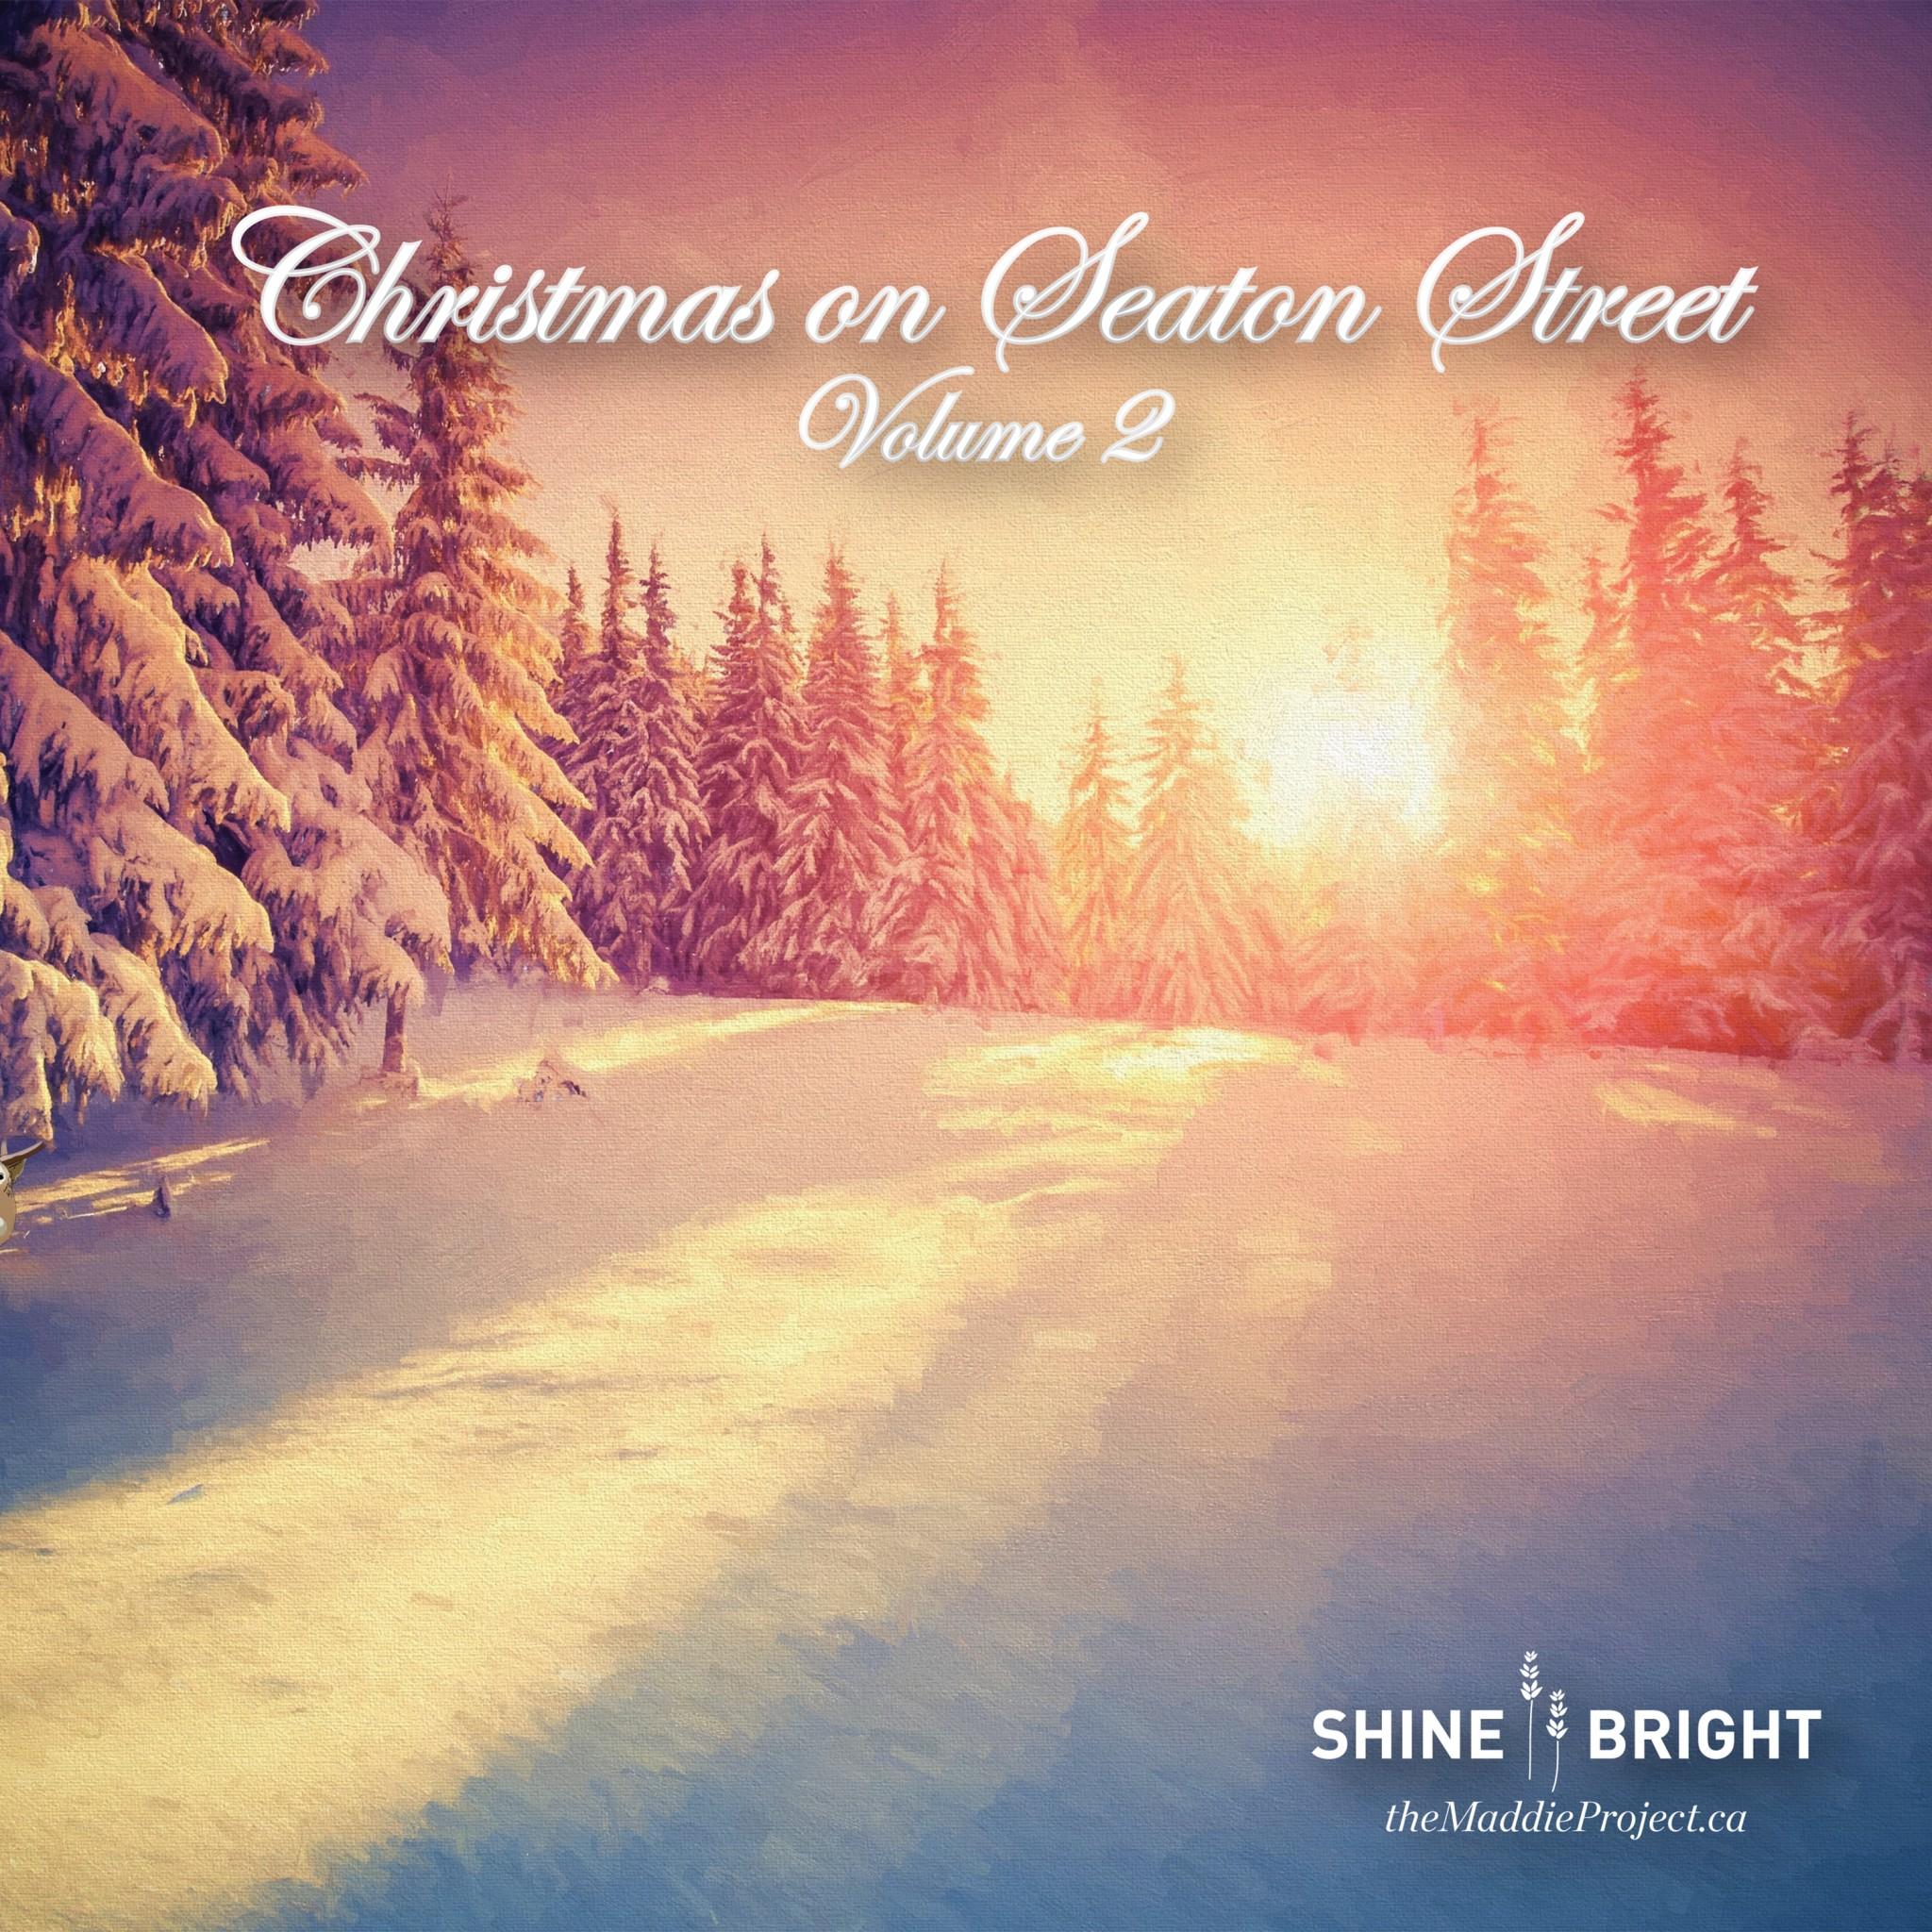 Christmas on Seaton St. Vol. 2 - THEJAZZBOX.ca